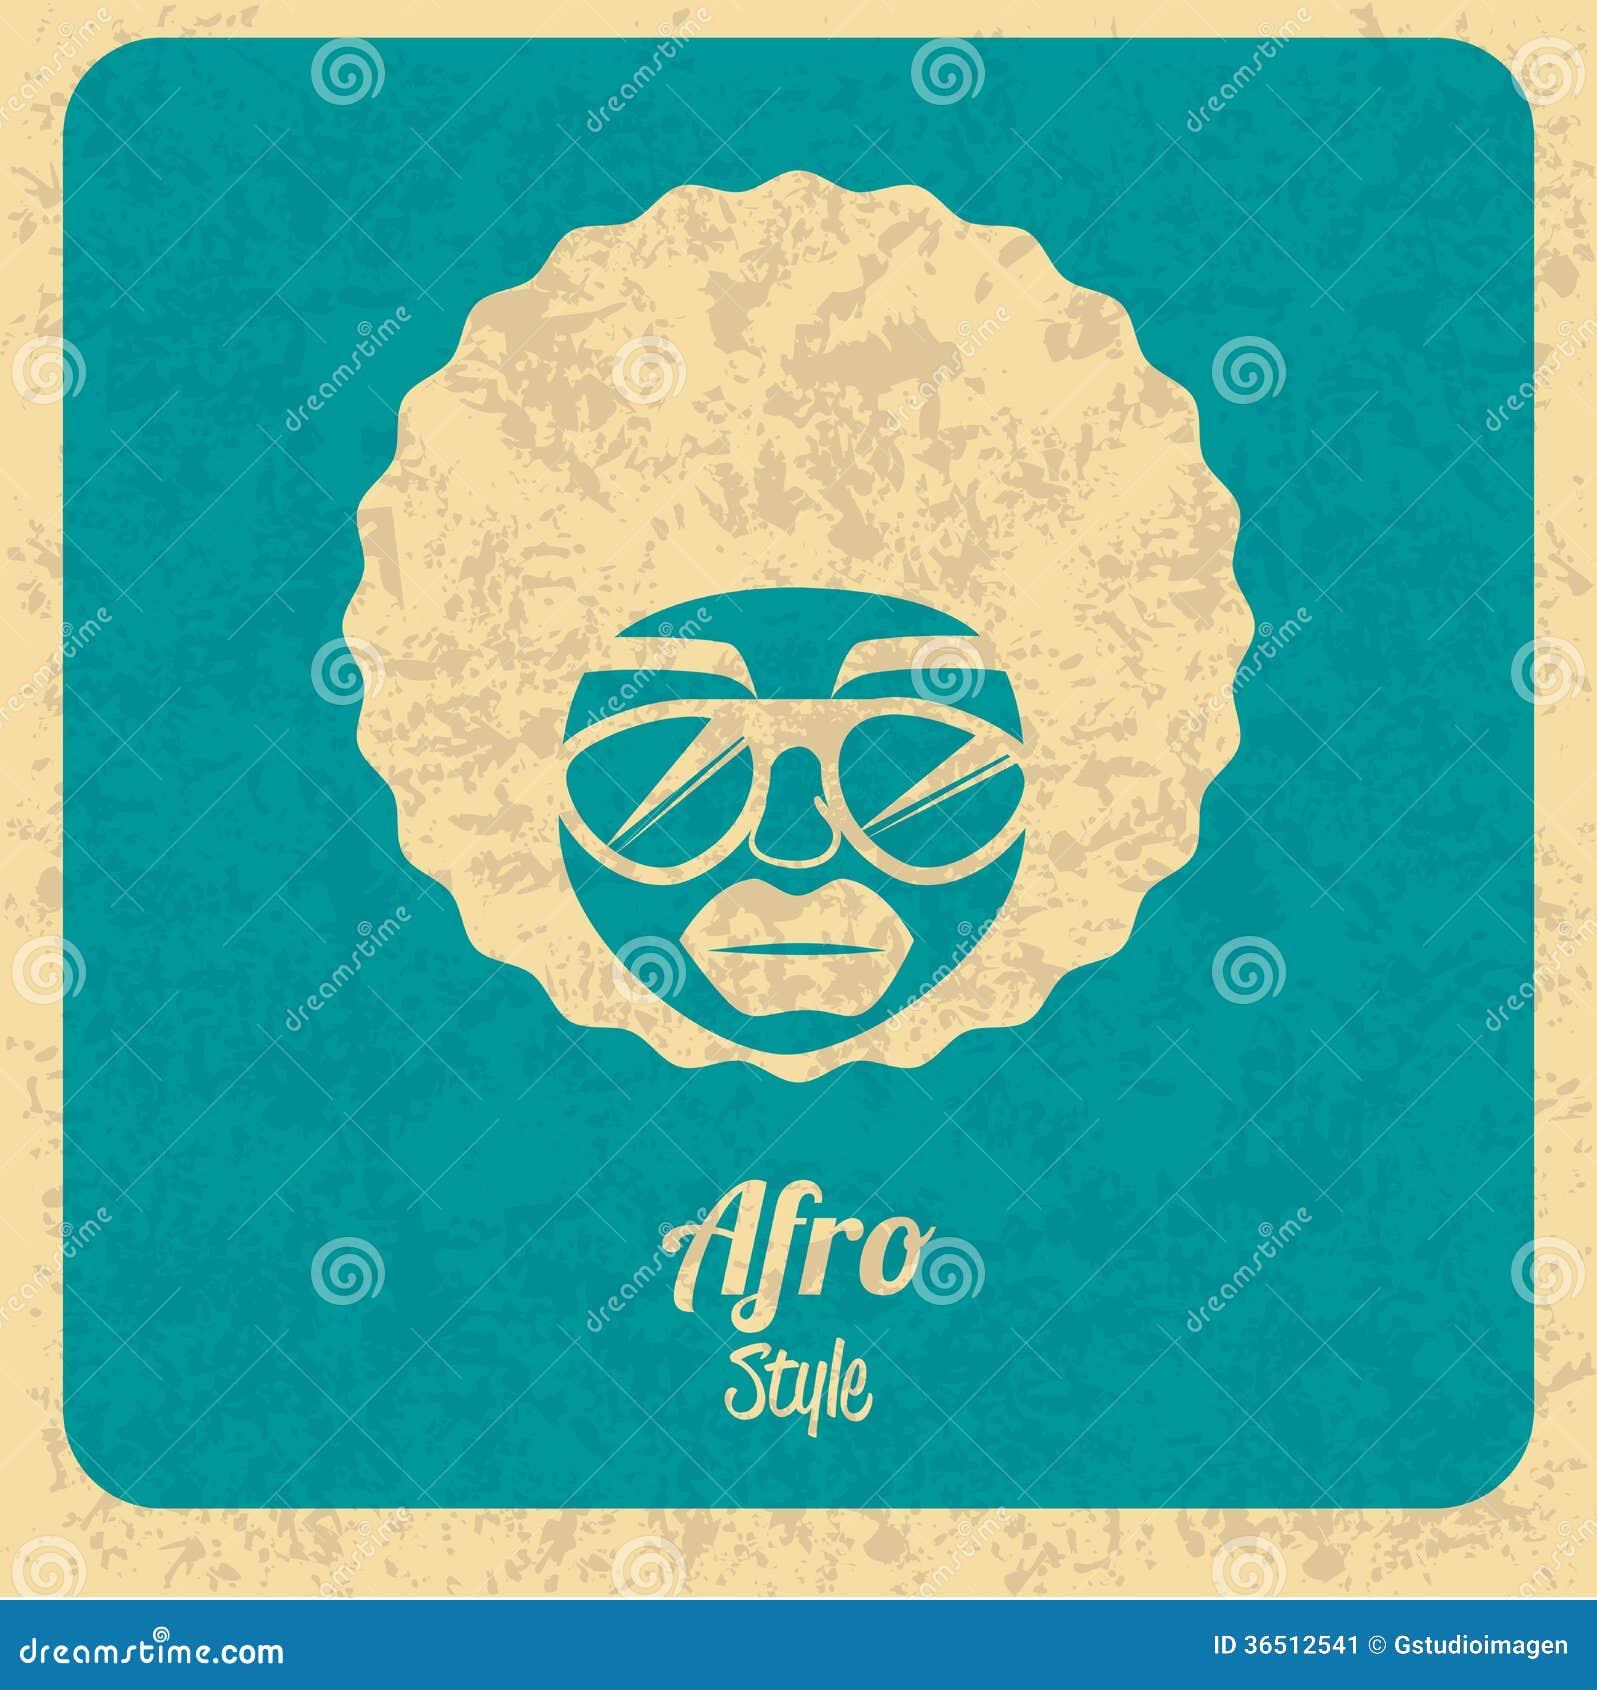 Afroartdesign